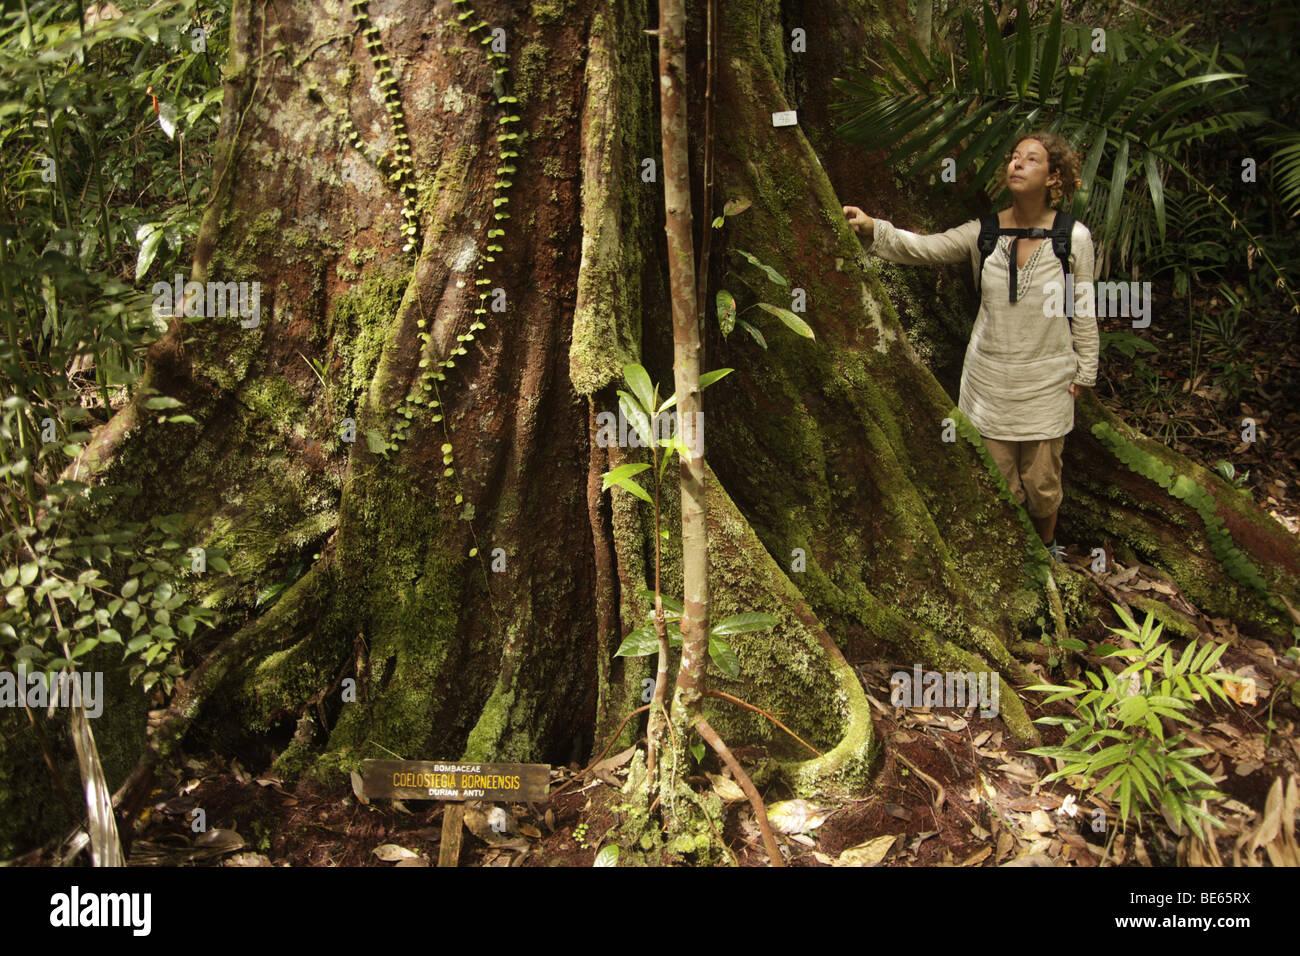 Tourist next to a giant rainforest tree in the Bako National Park near Kuching, Sarawak, Borneo, Malaysia, Southeast - Stock Image